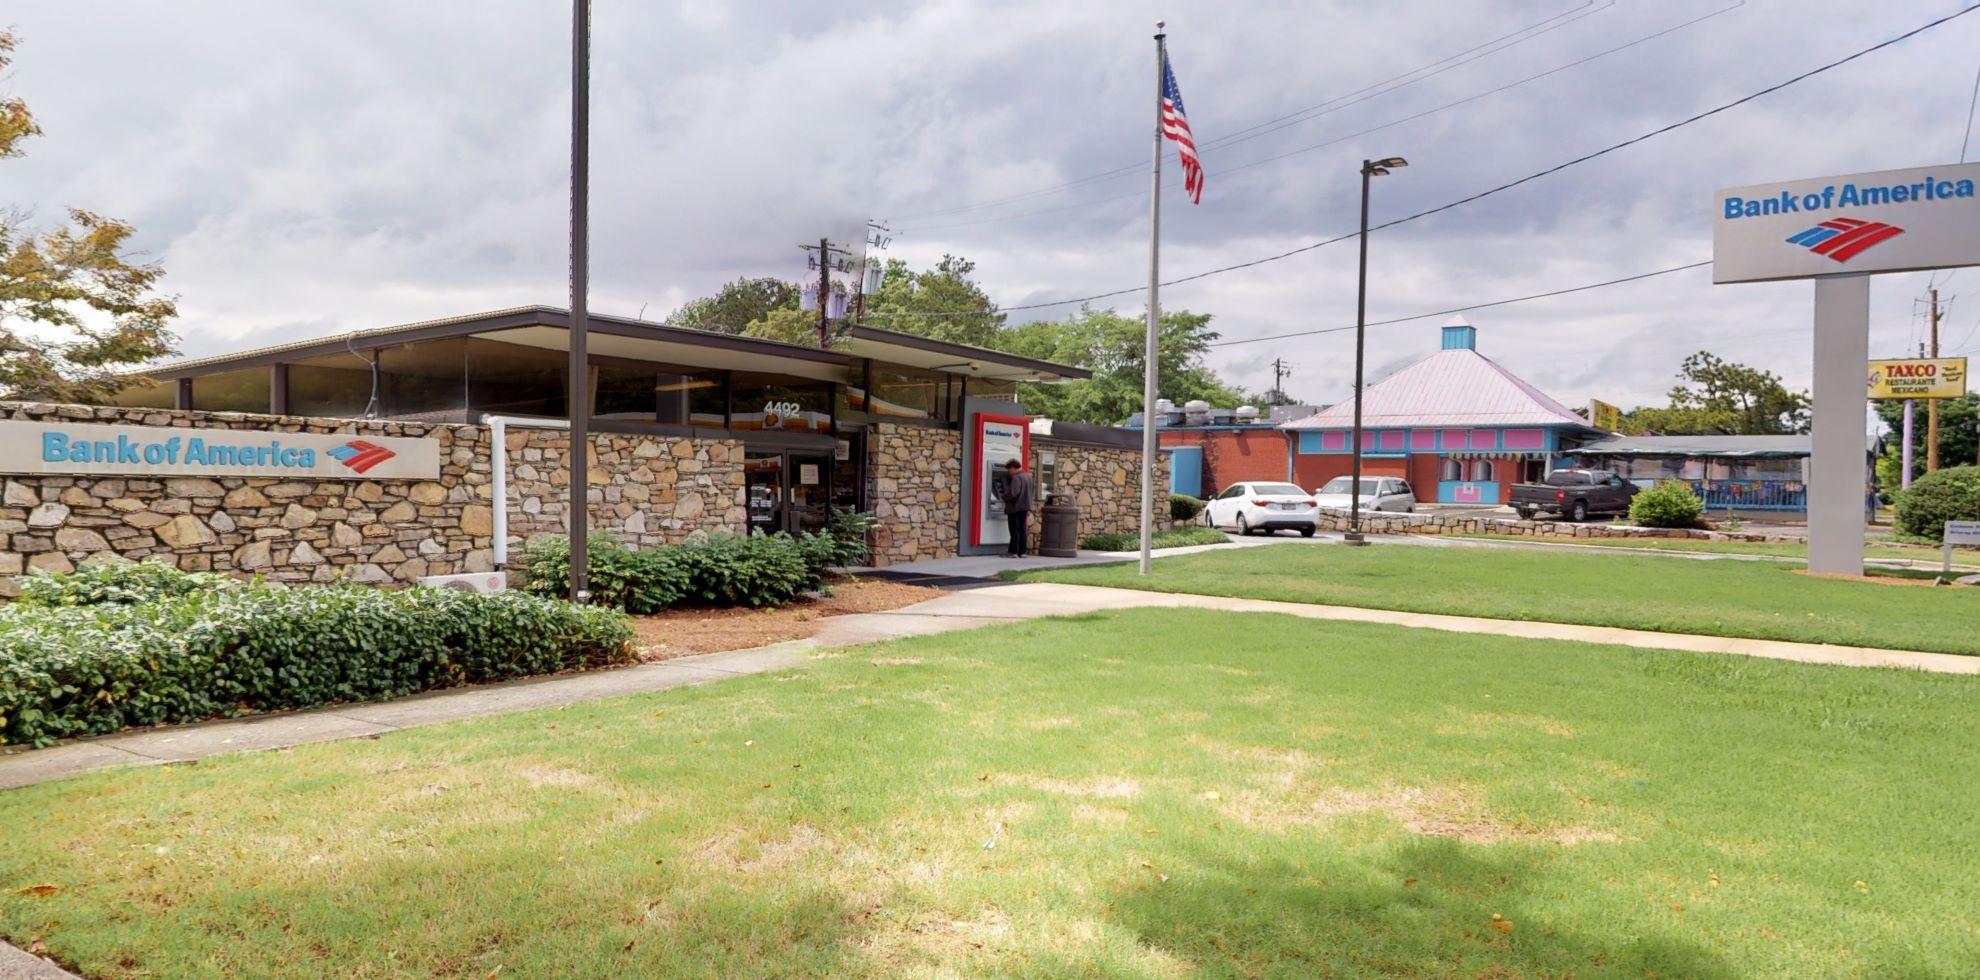 Bank of America financial center with drive-thru ATM | 4492 Roswell Rd NE, Atlanta, GA 30342